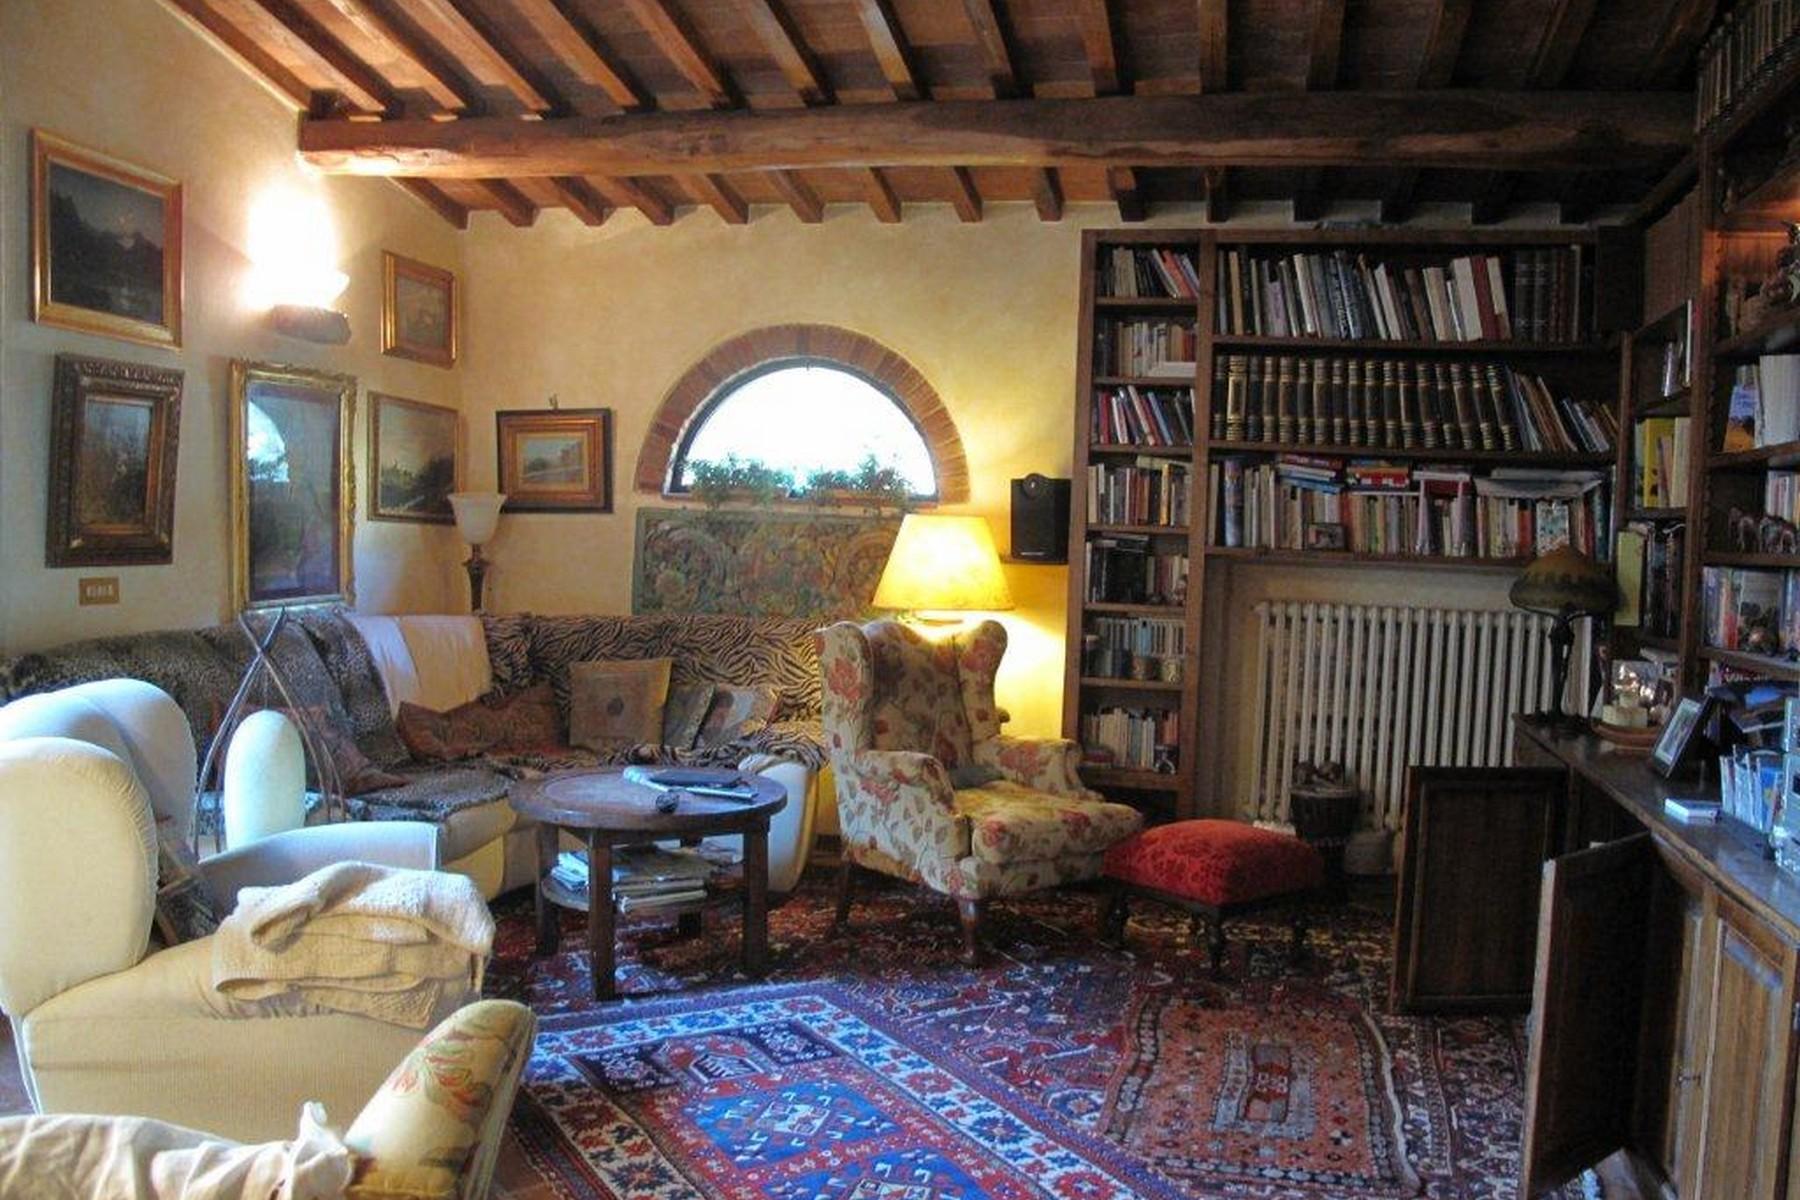 Villa in Vendita a Greve In Chianti: 5 locali, 400 mq - Foto 9